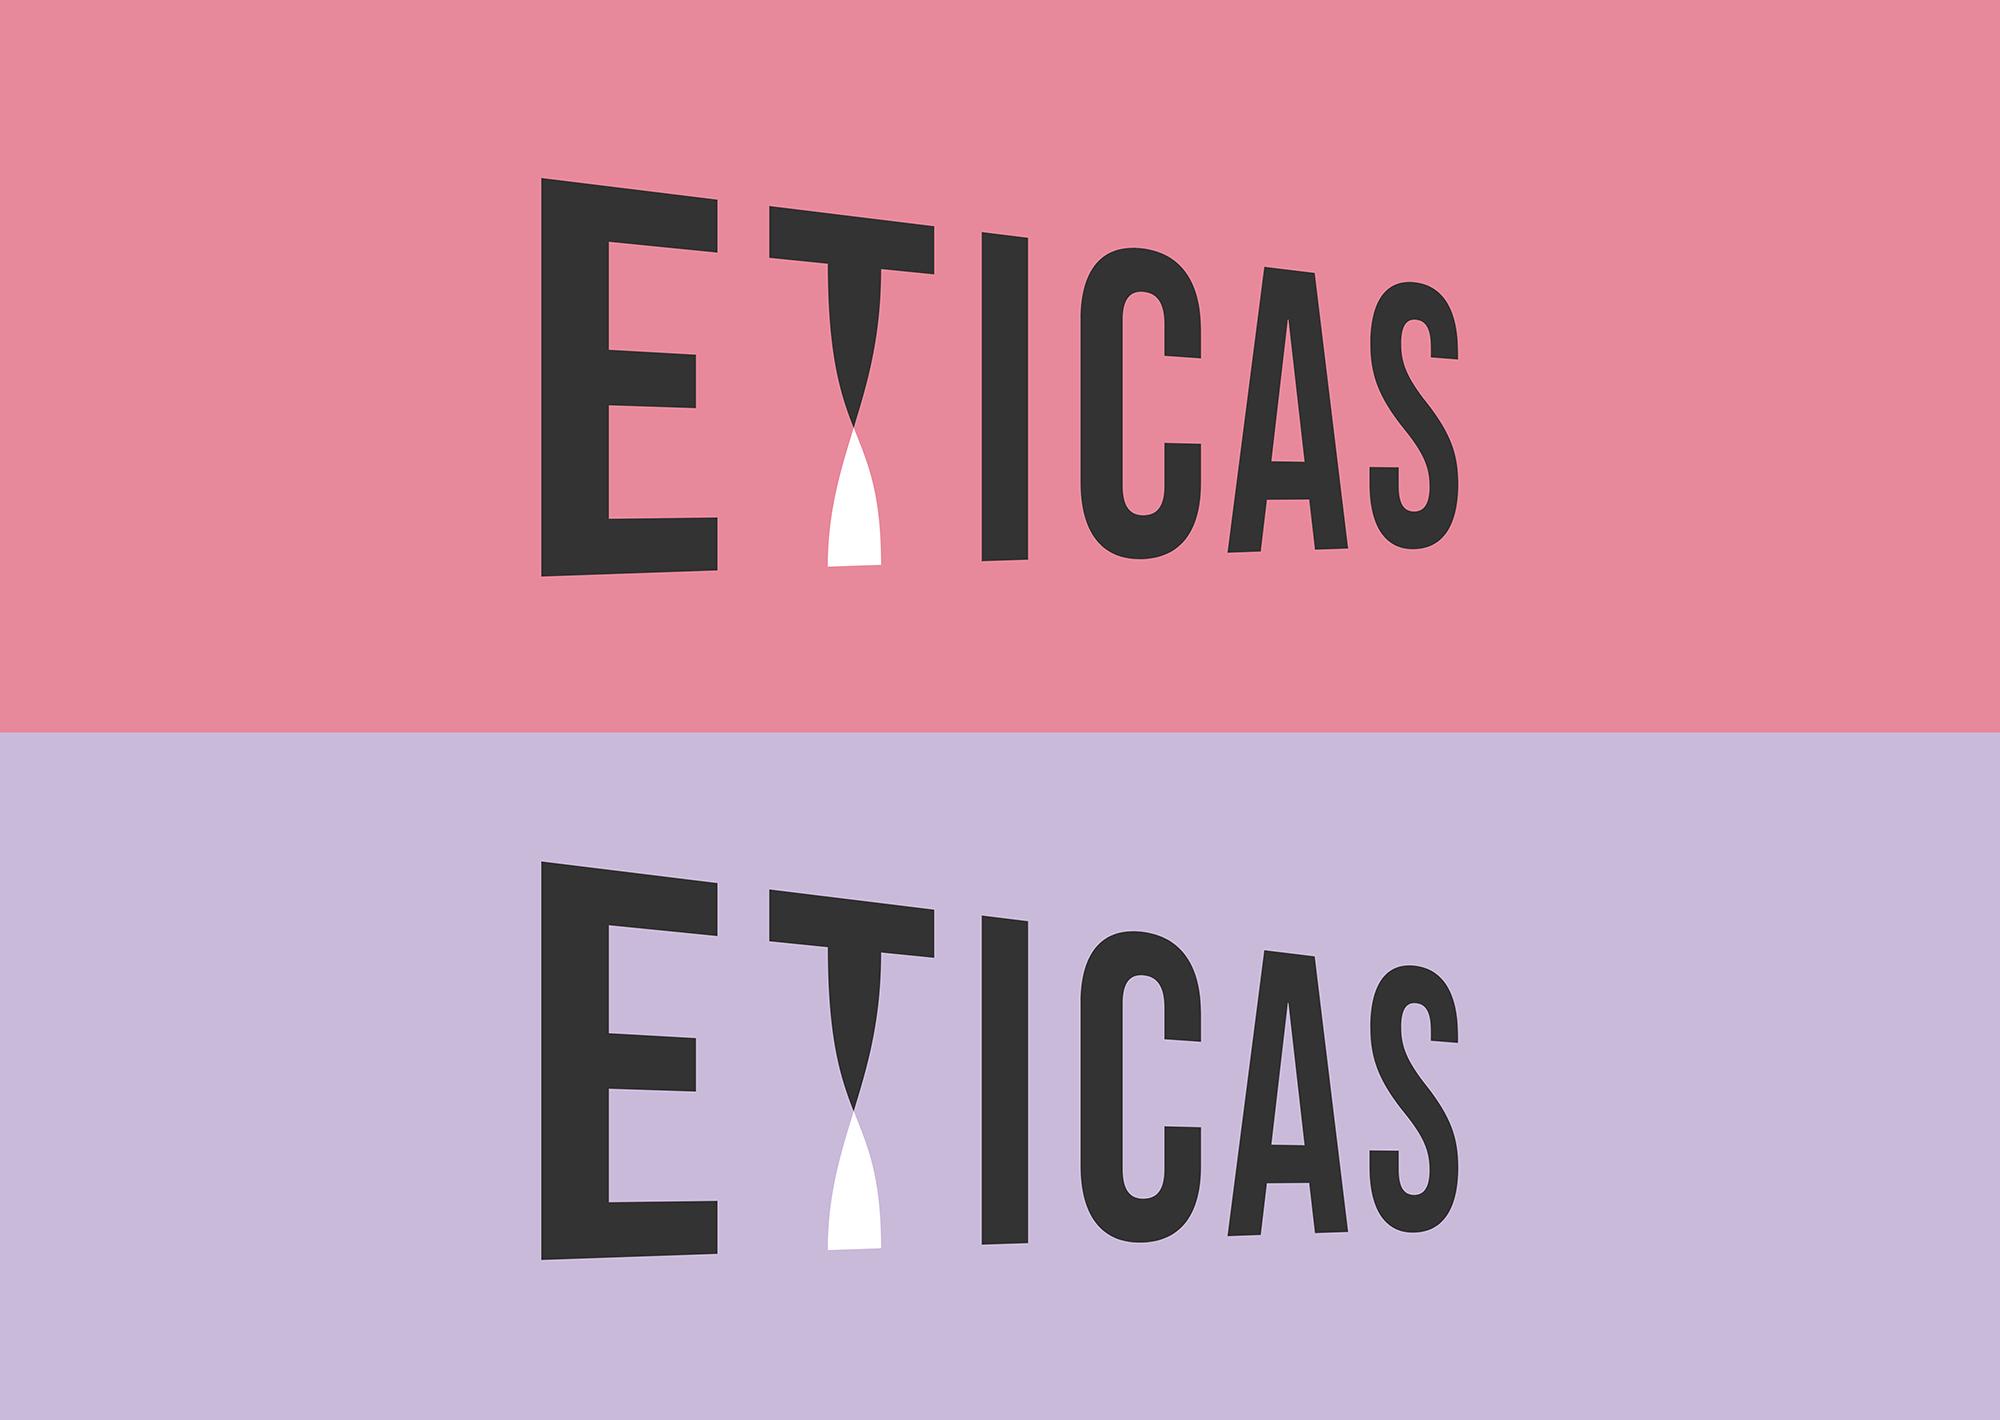 03_eticas_rdc_03.png